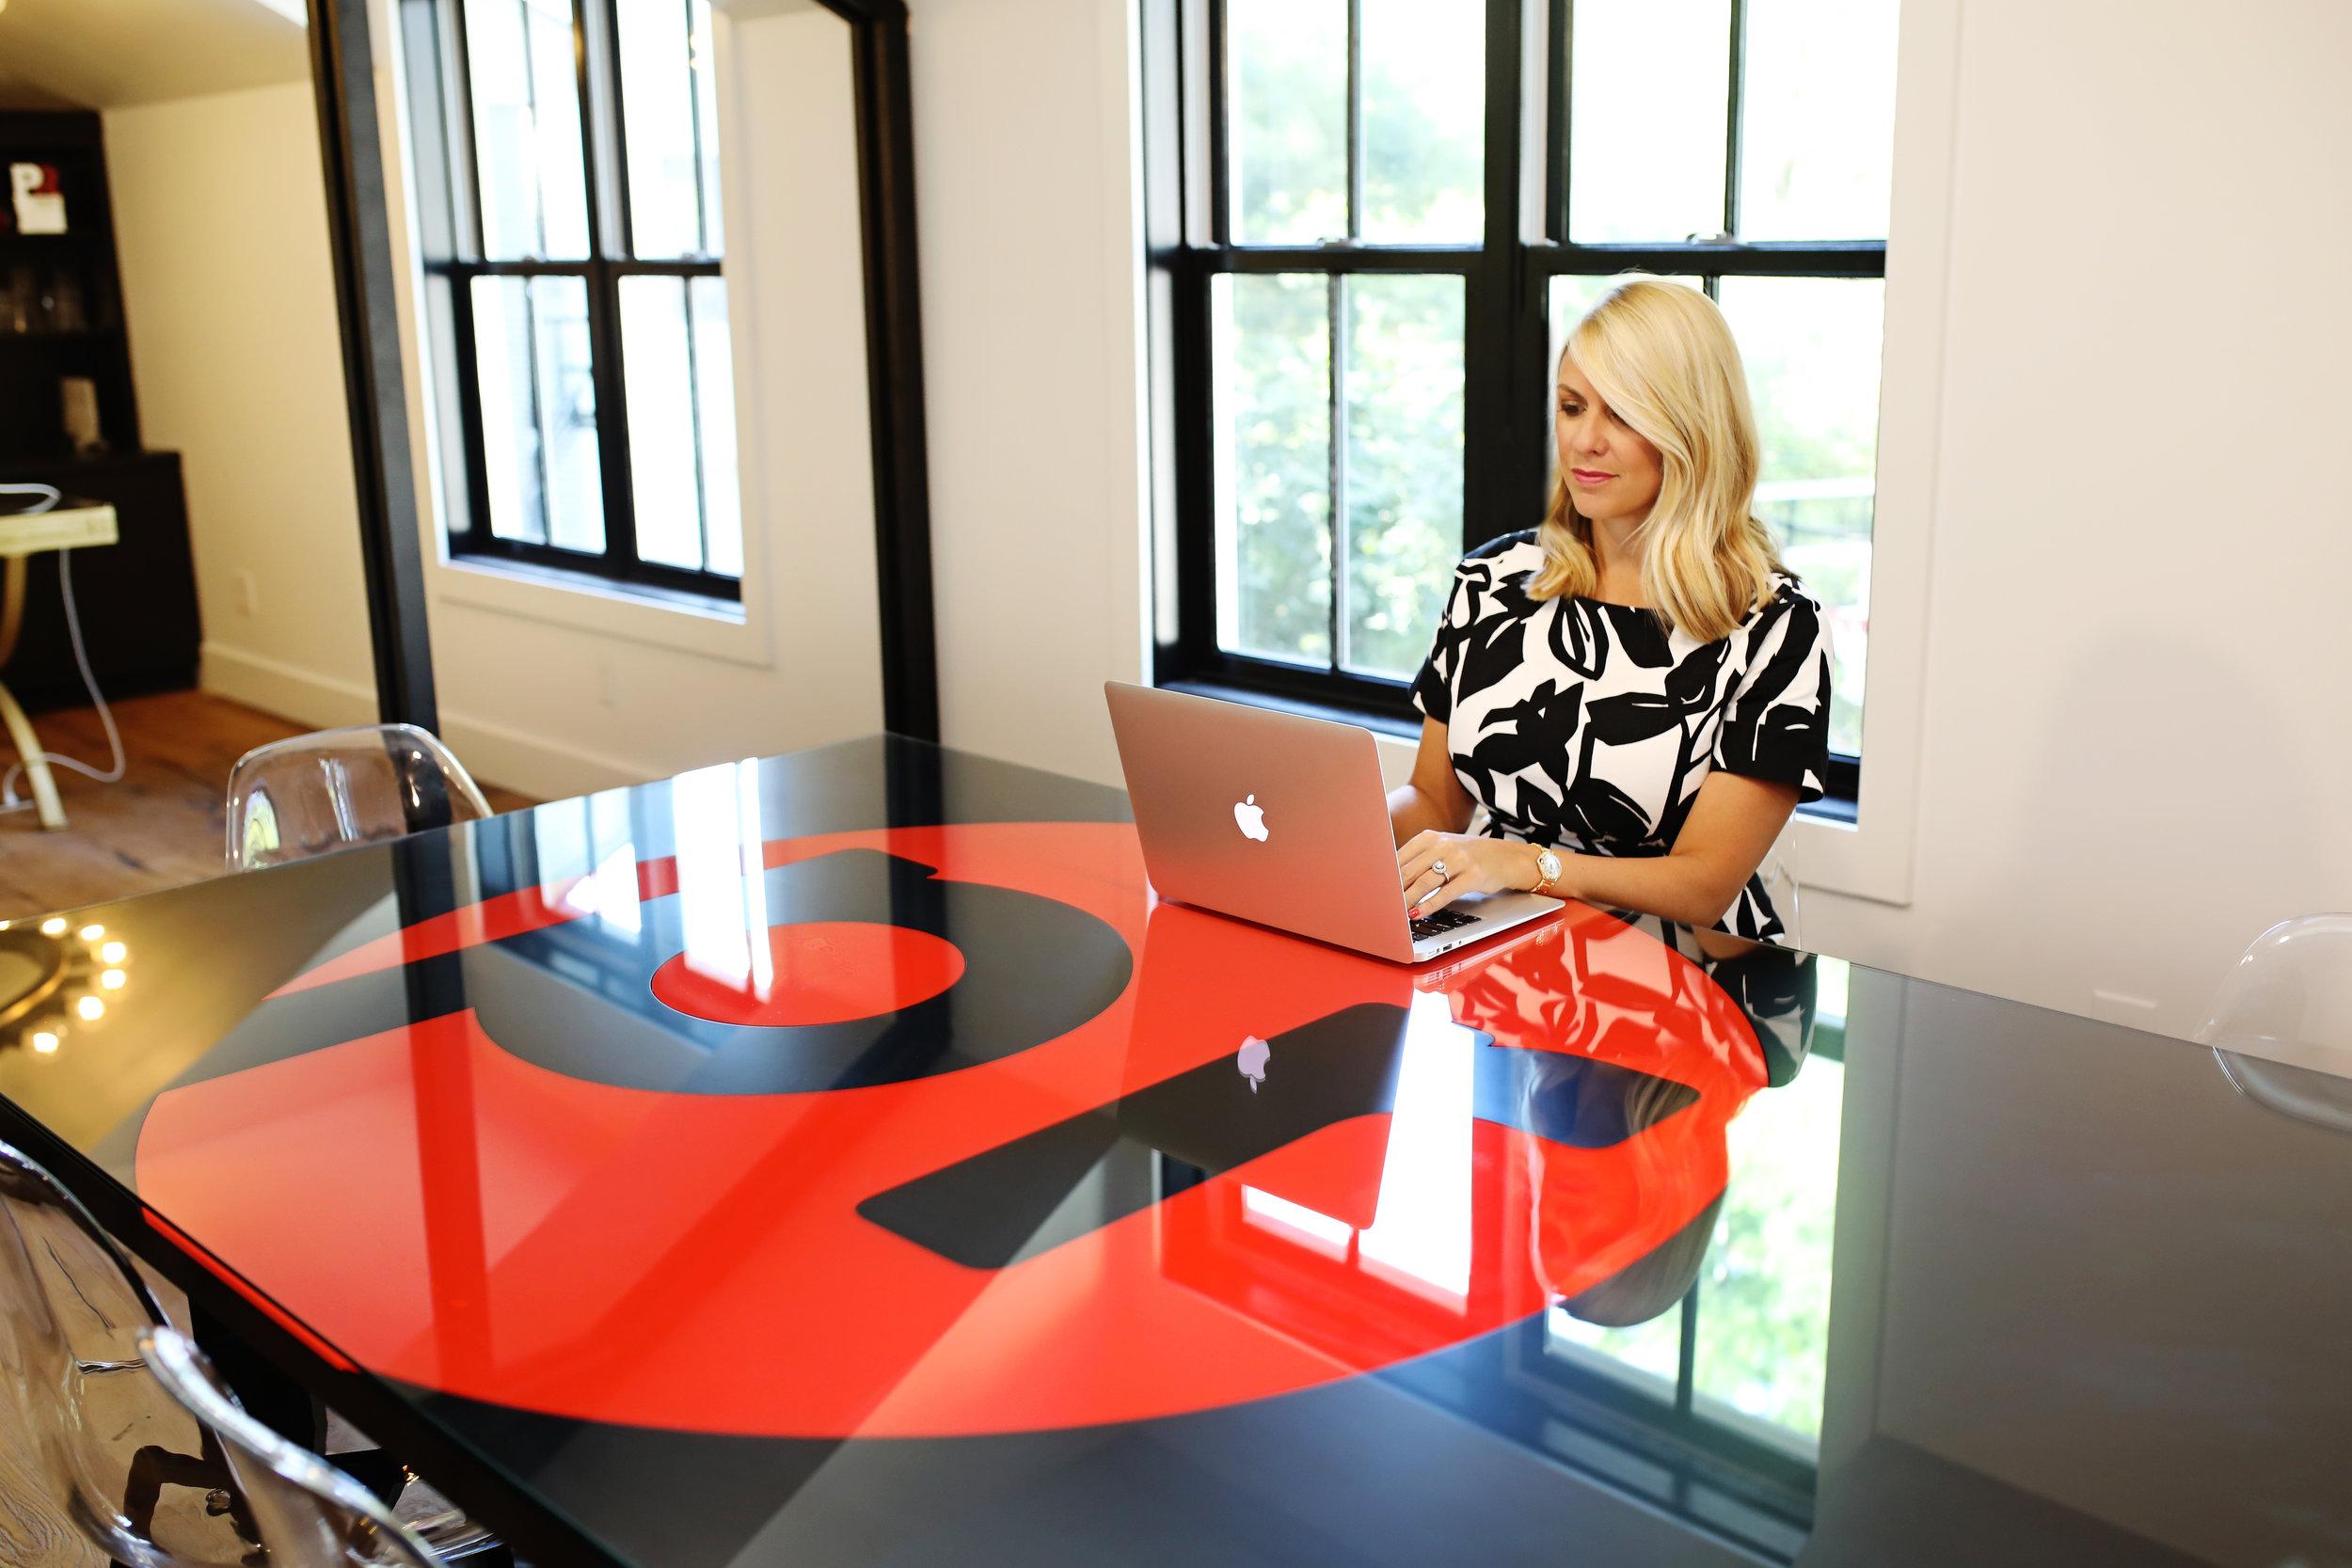 Megan-Shroy-Approach-Marketing-Best-Of-2018-Agency-Advice